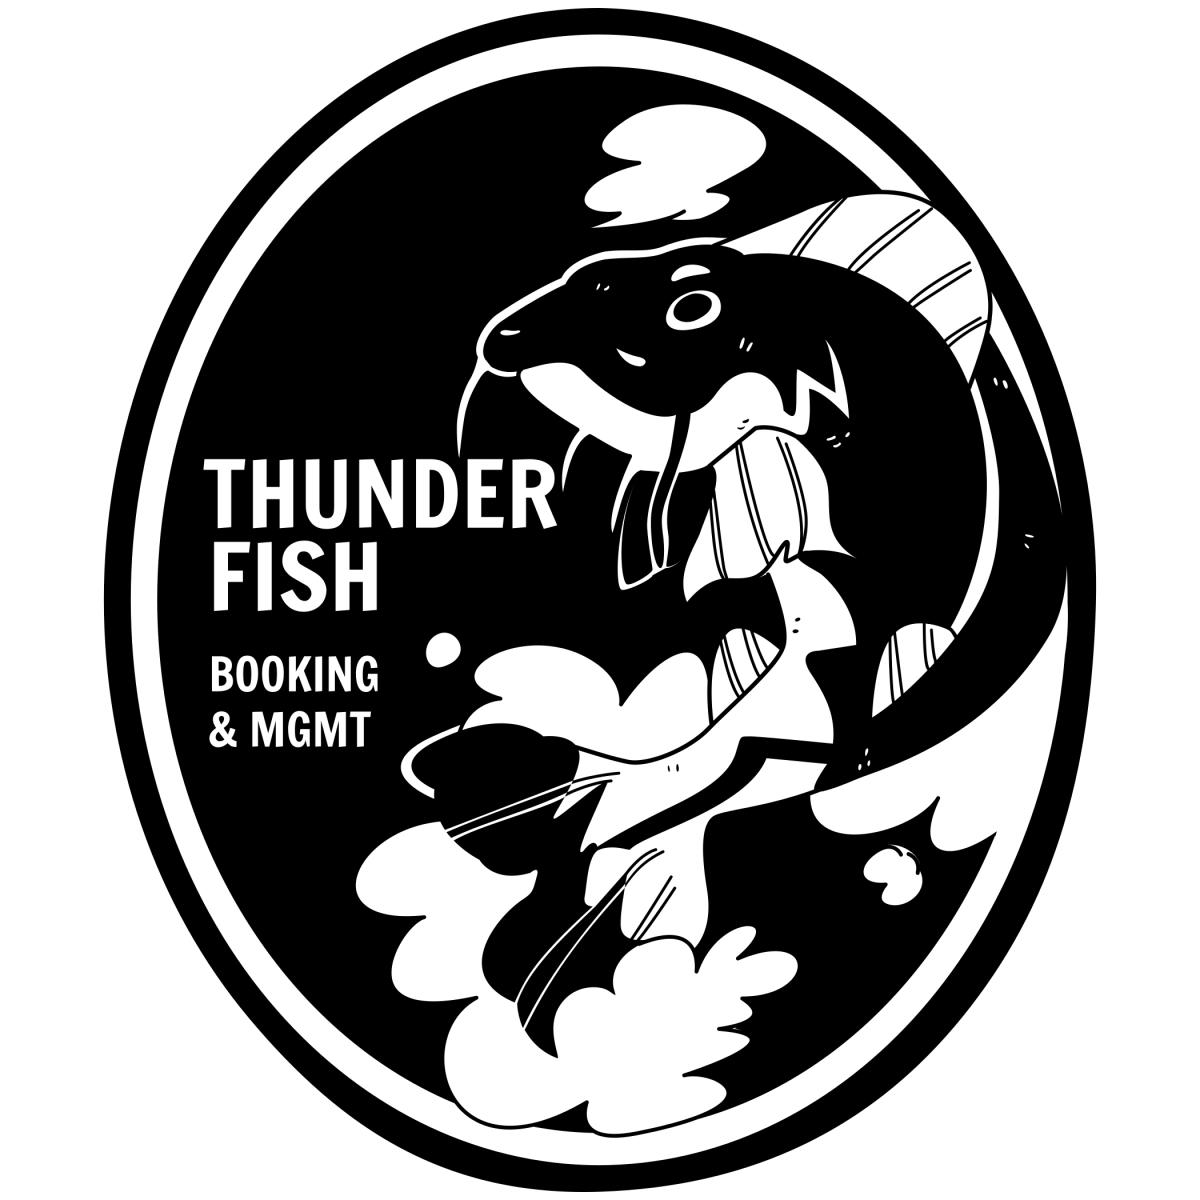 ThunderFish_Circle_Solid.jpg